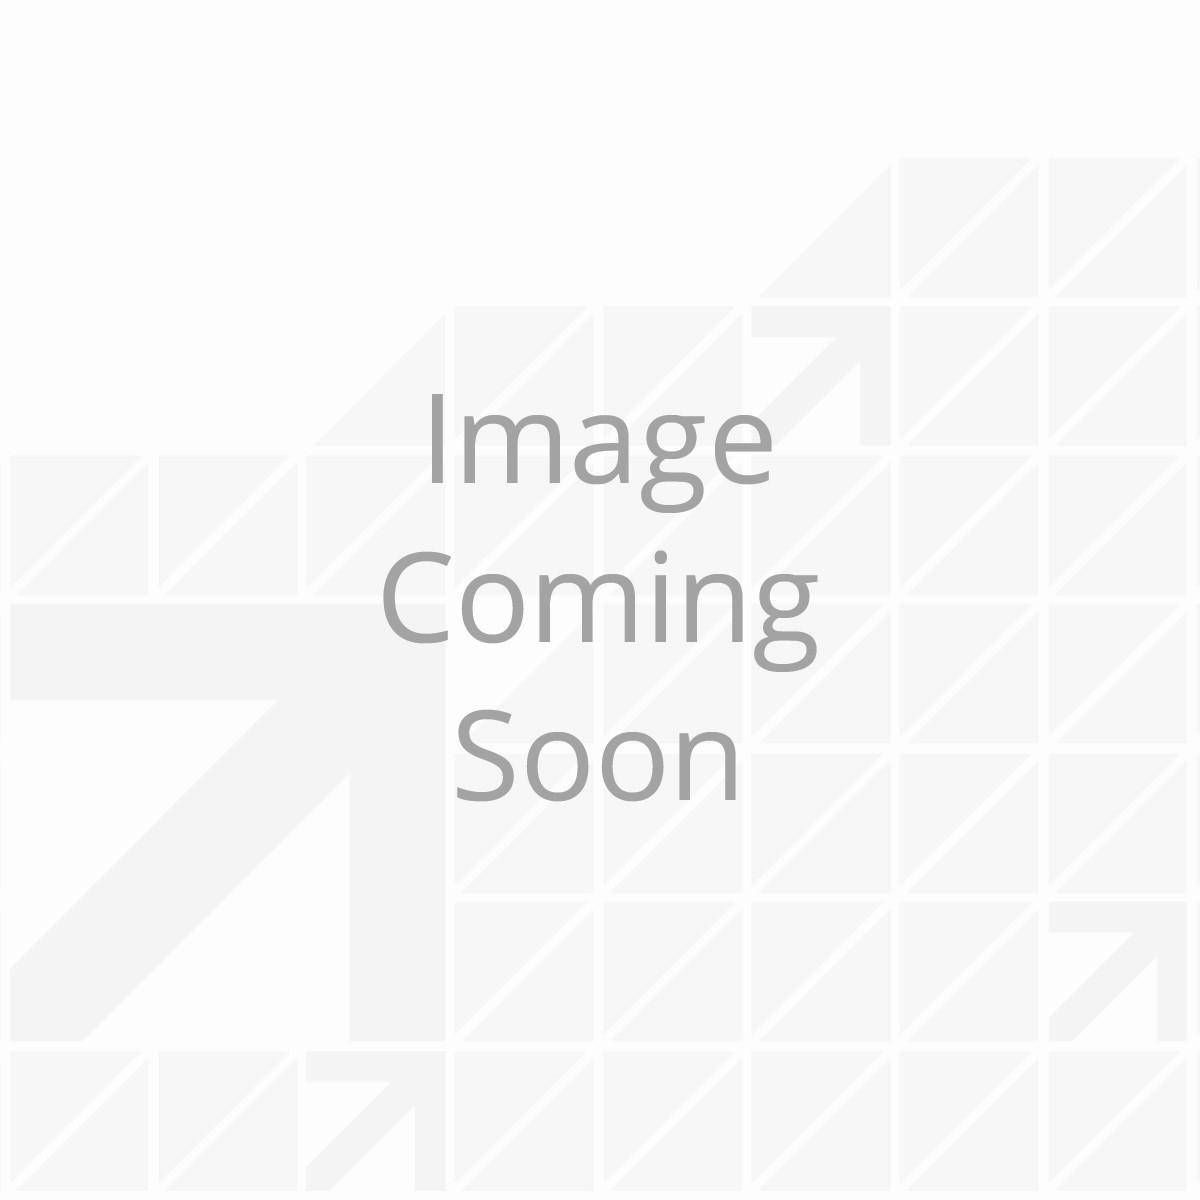 SureShade Sport Arms for Power Bimini